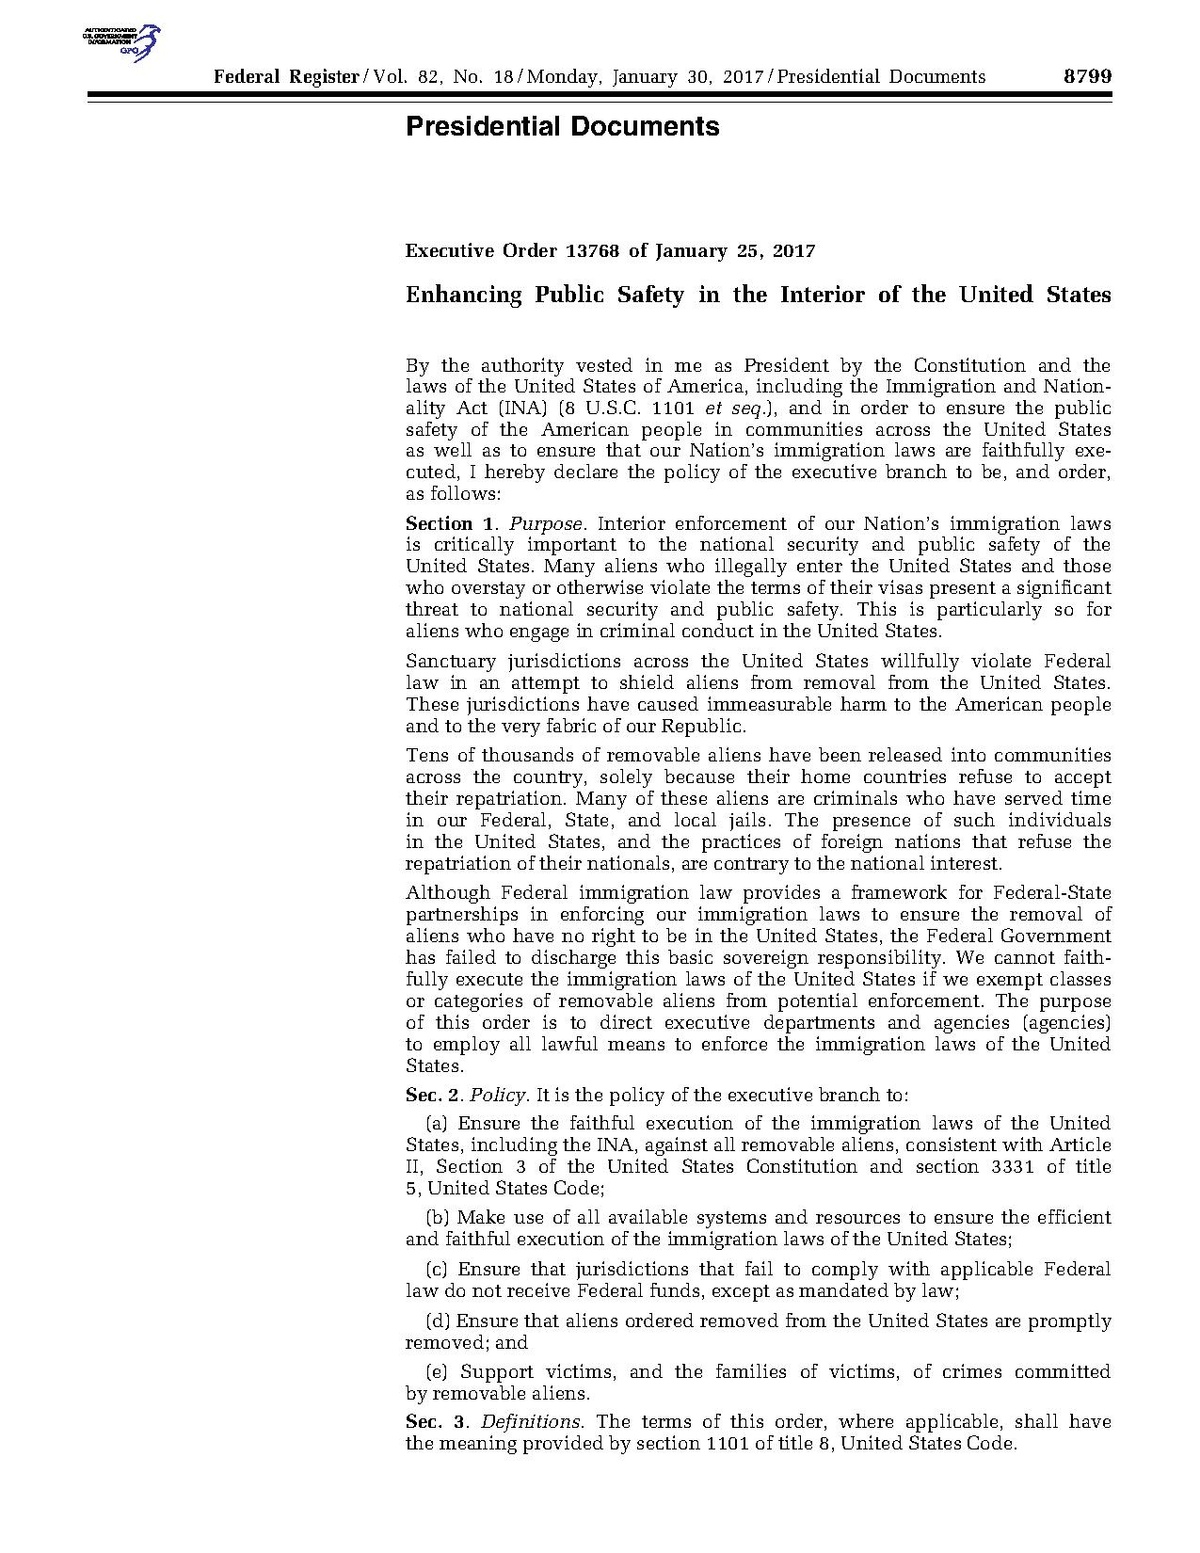 Executive Order 13768 Wikipedia